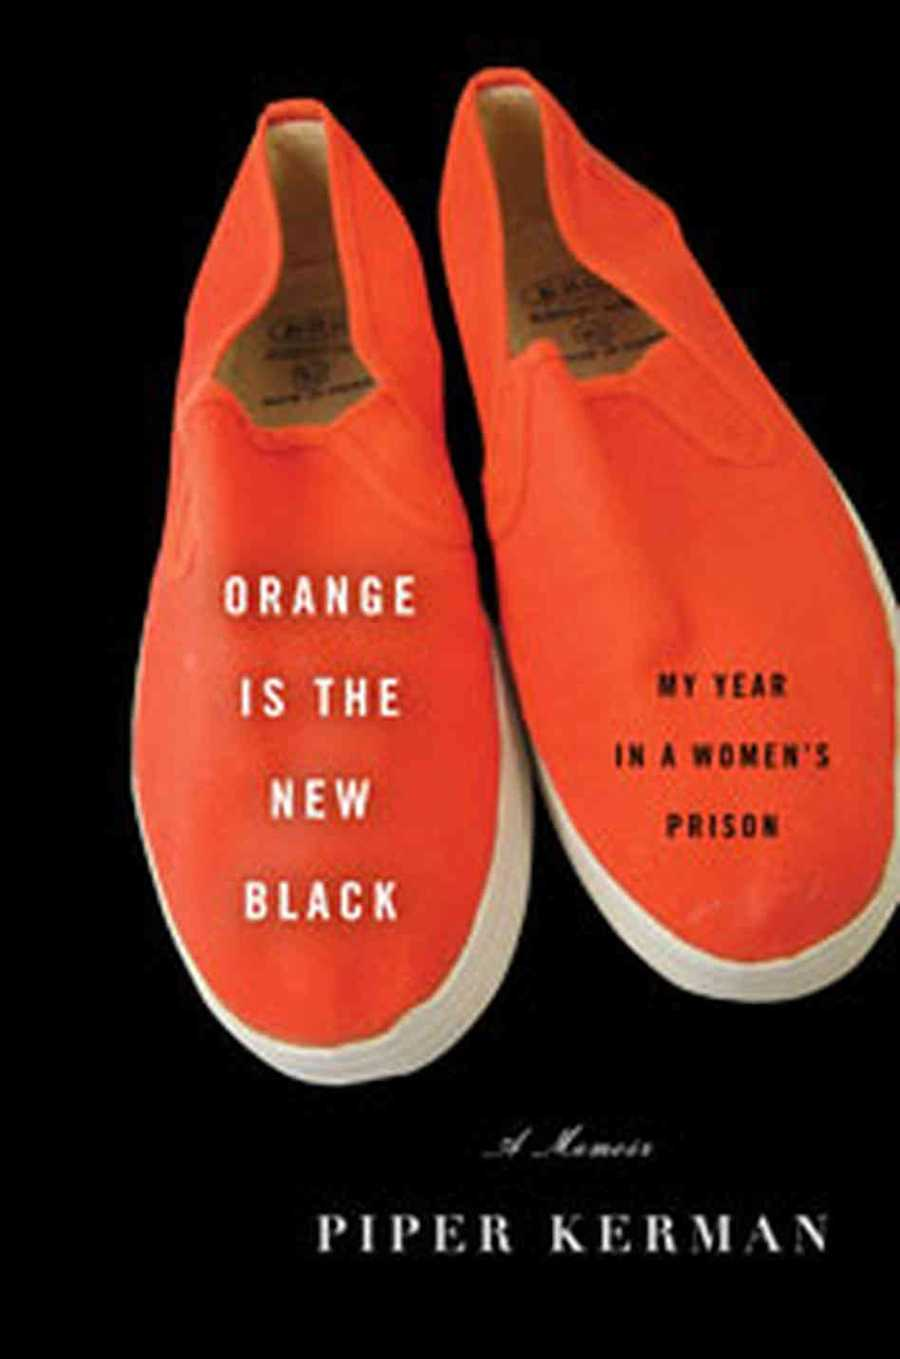 4. Orange is the New Black by Piper Kerman